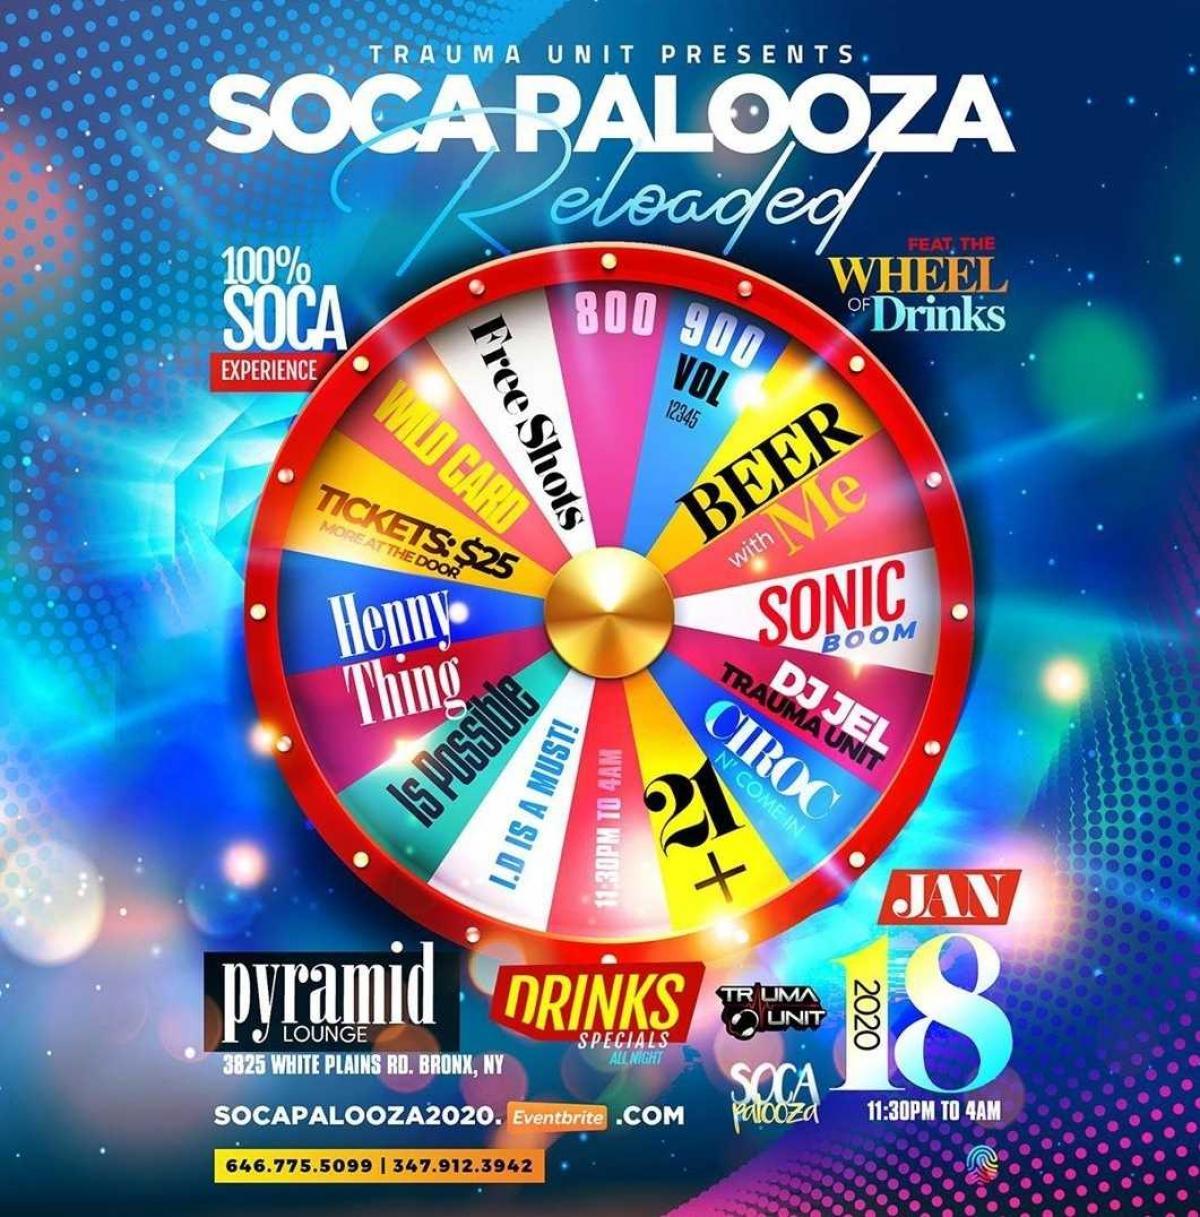 Soca Palooza flyer or graphic.